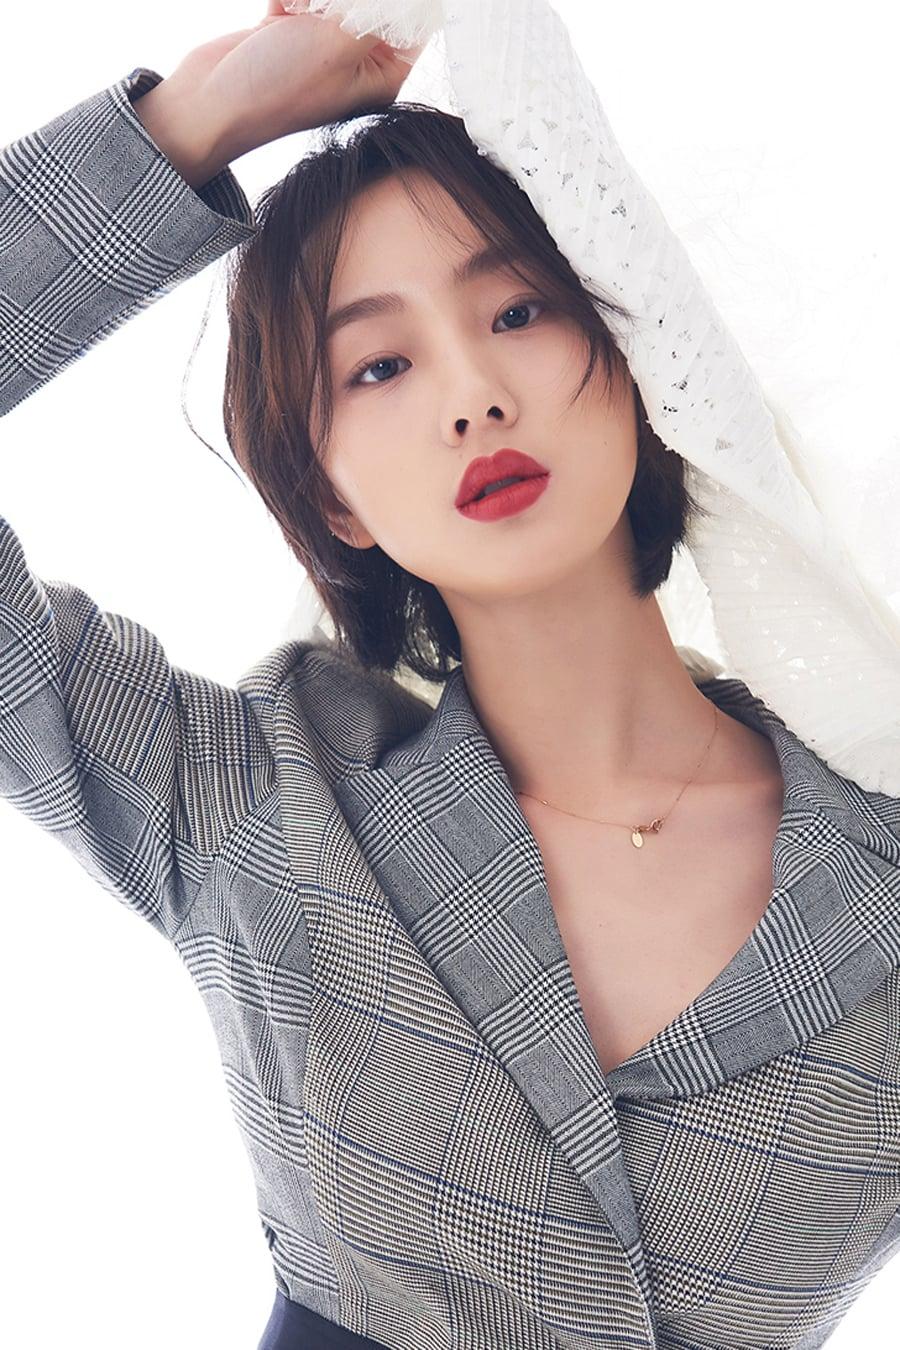 Deng Yuli